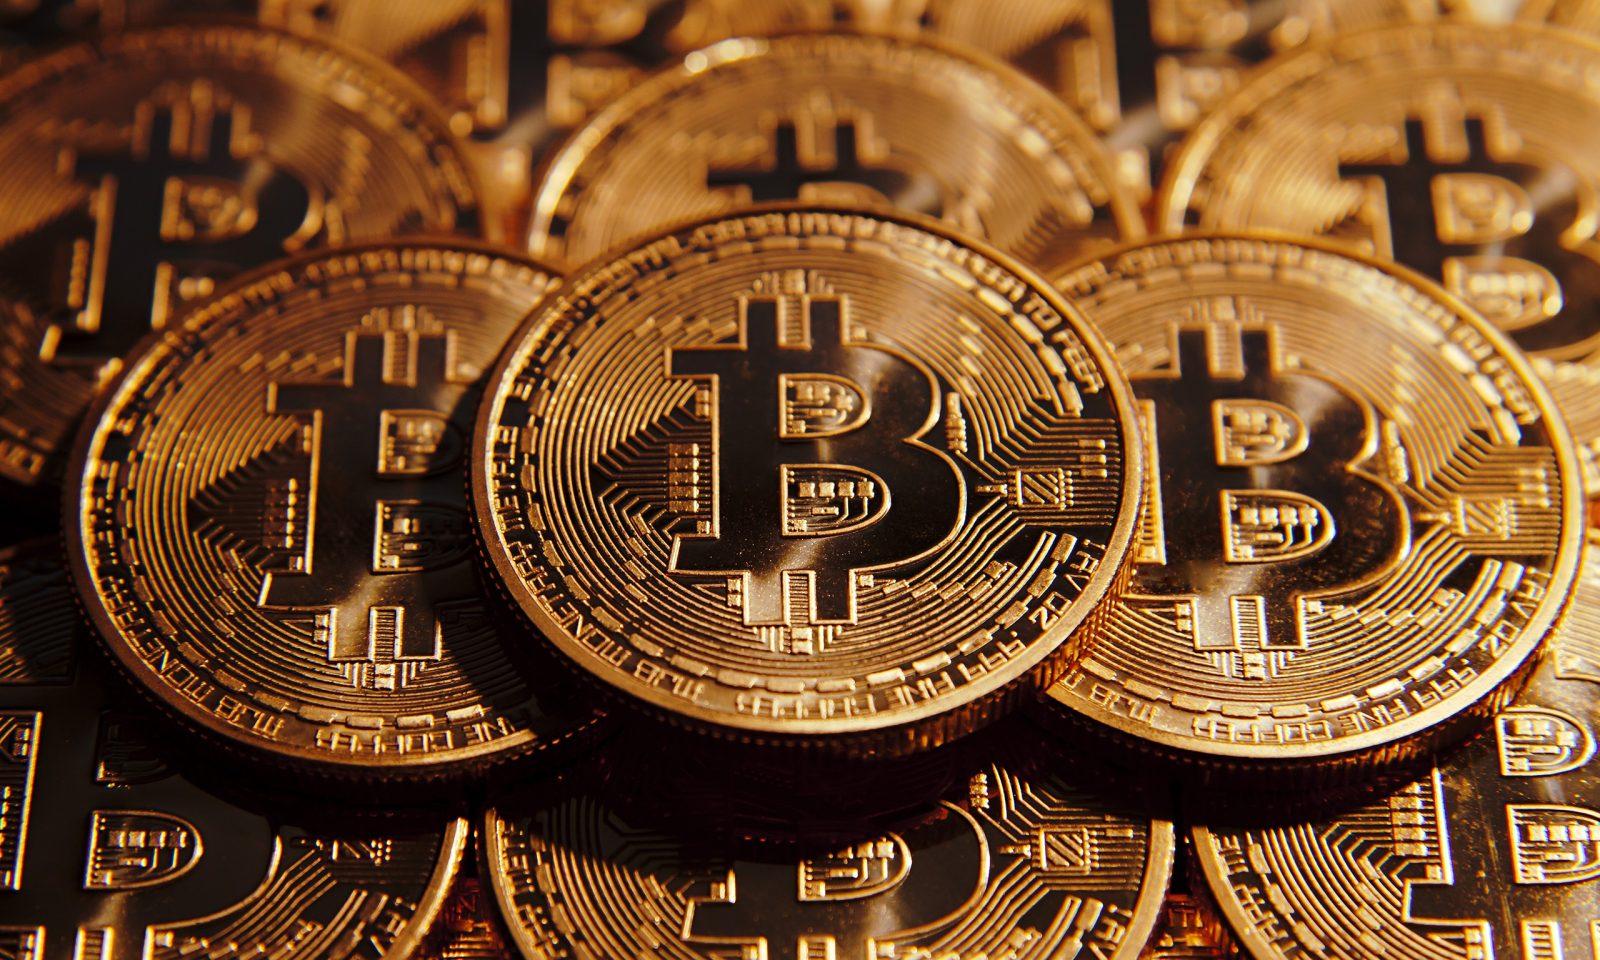 cât câștigă bitcoins